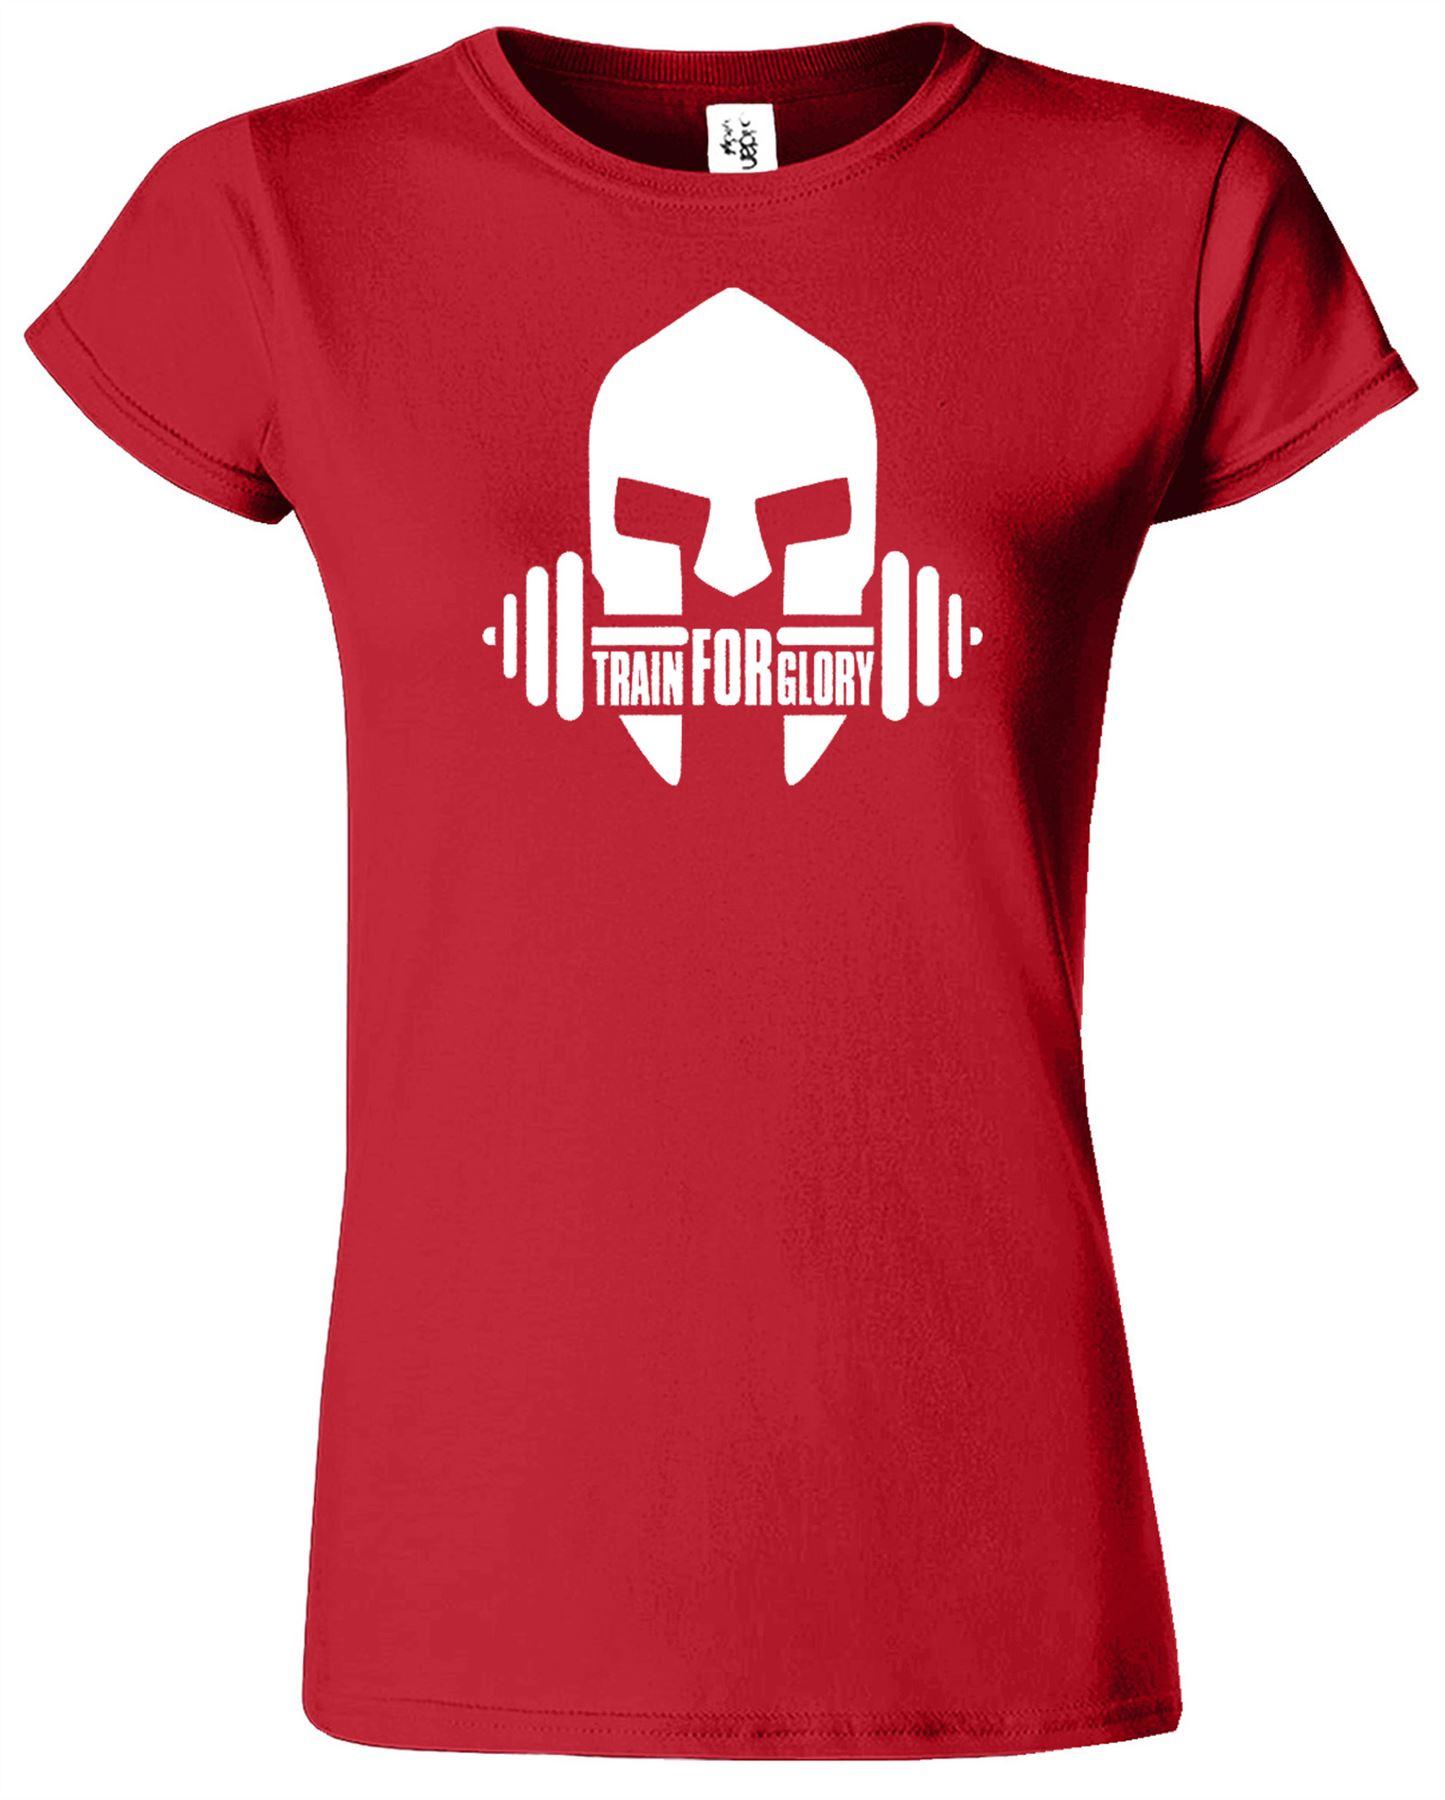 Gym Crossfit T Shirt Women Body Building Workout Gym